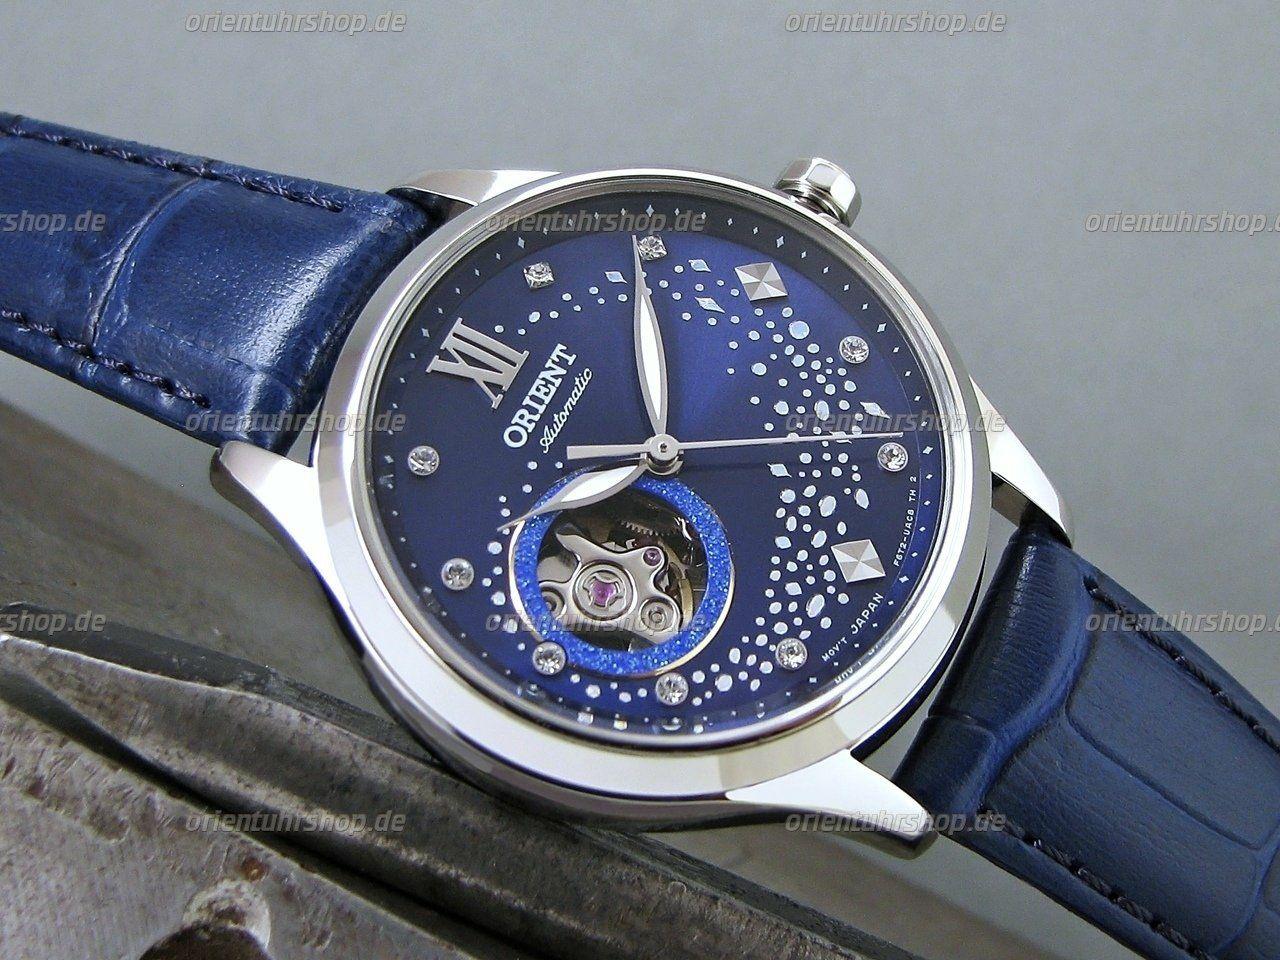 Masywnie Zegarek damski Orient Blue Moon II Automatic - Pepper.pl JL23